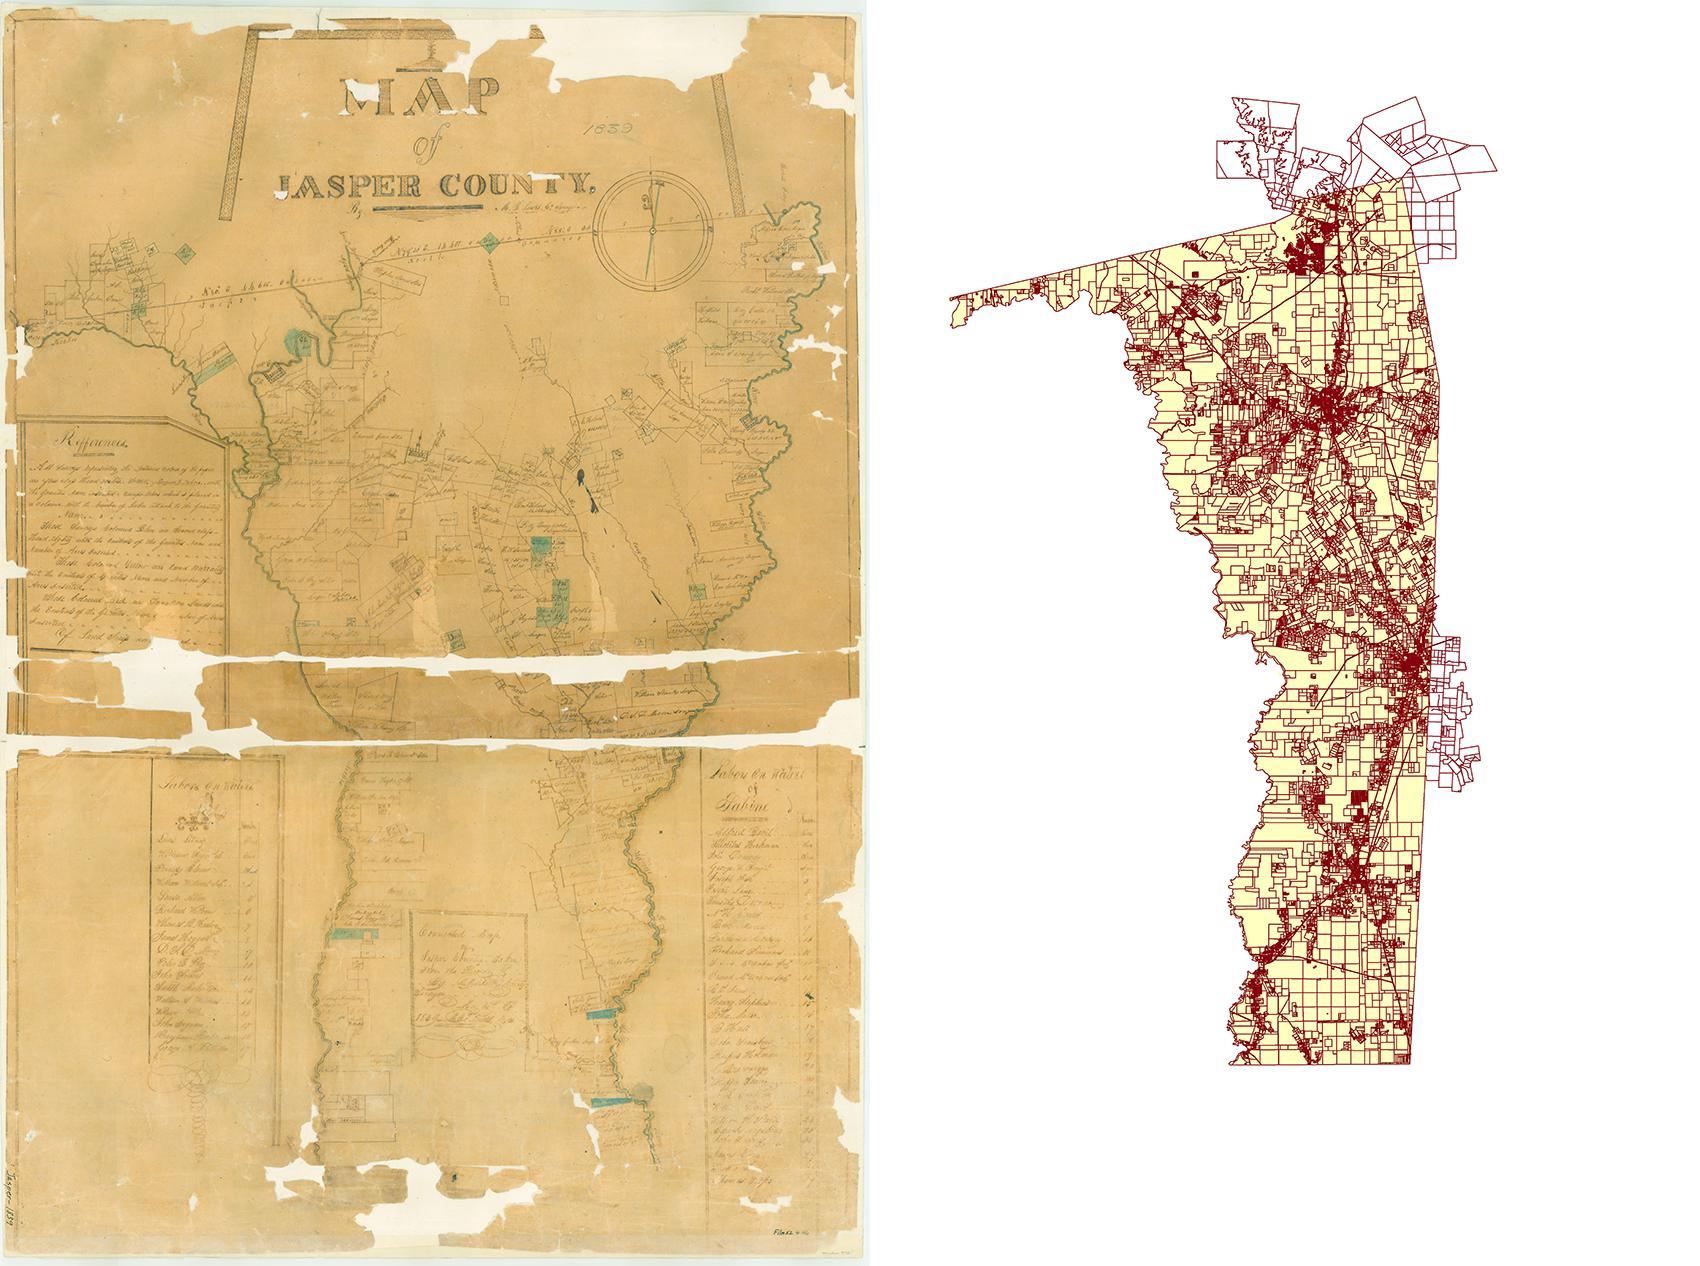 Jasper County Map 1839 & 2013